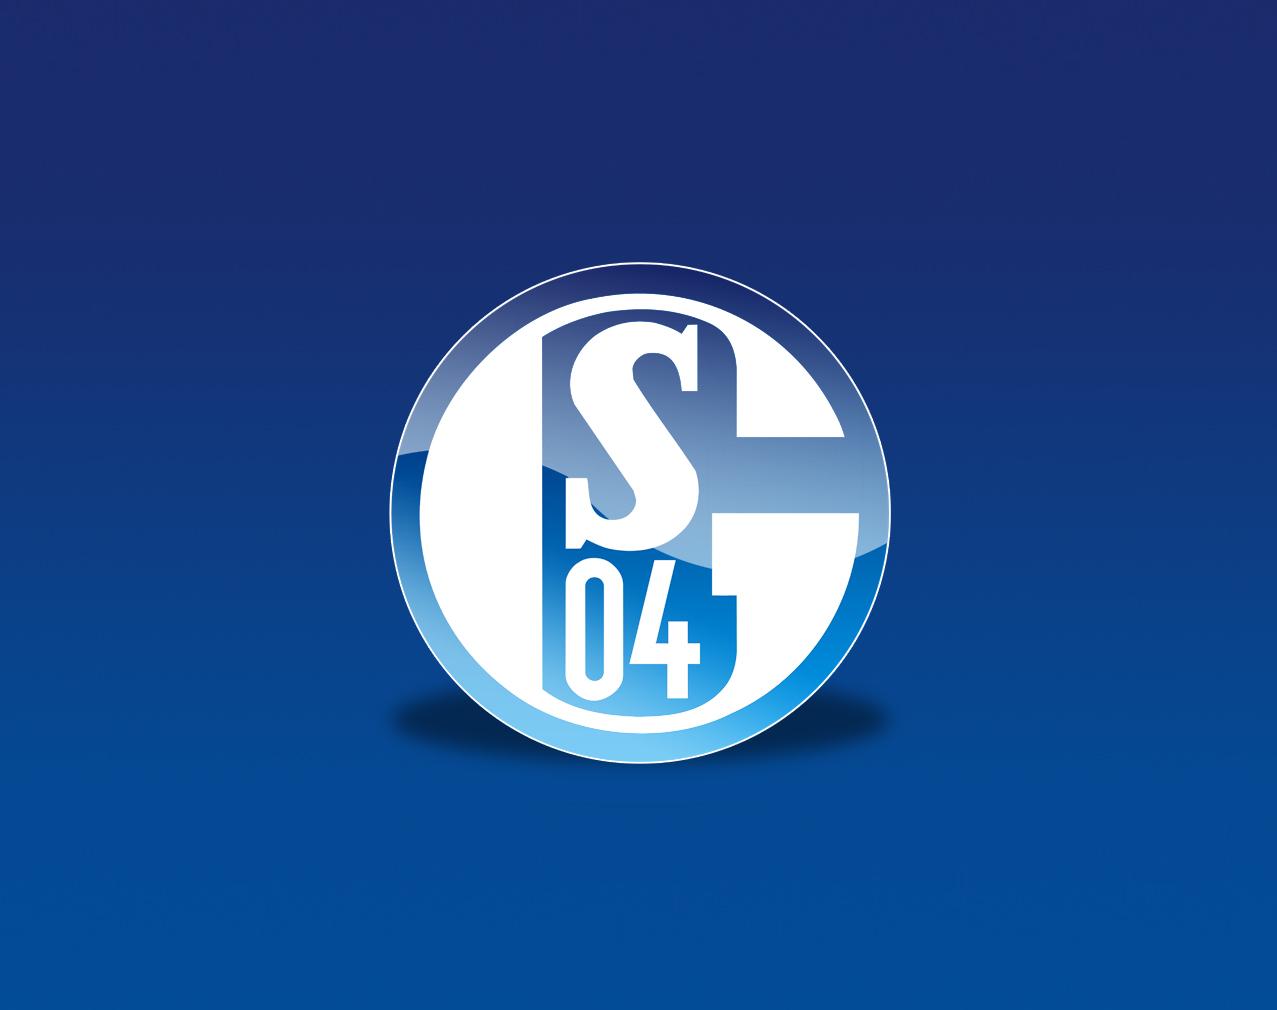 Schalke 04 Wallpaper HD | Me | Wallpaper free download ...